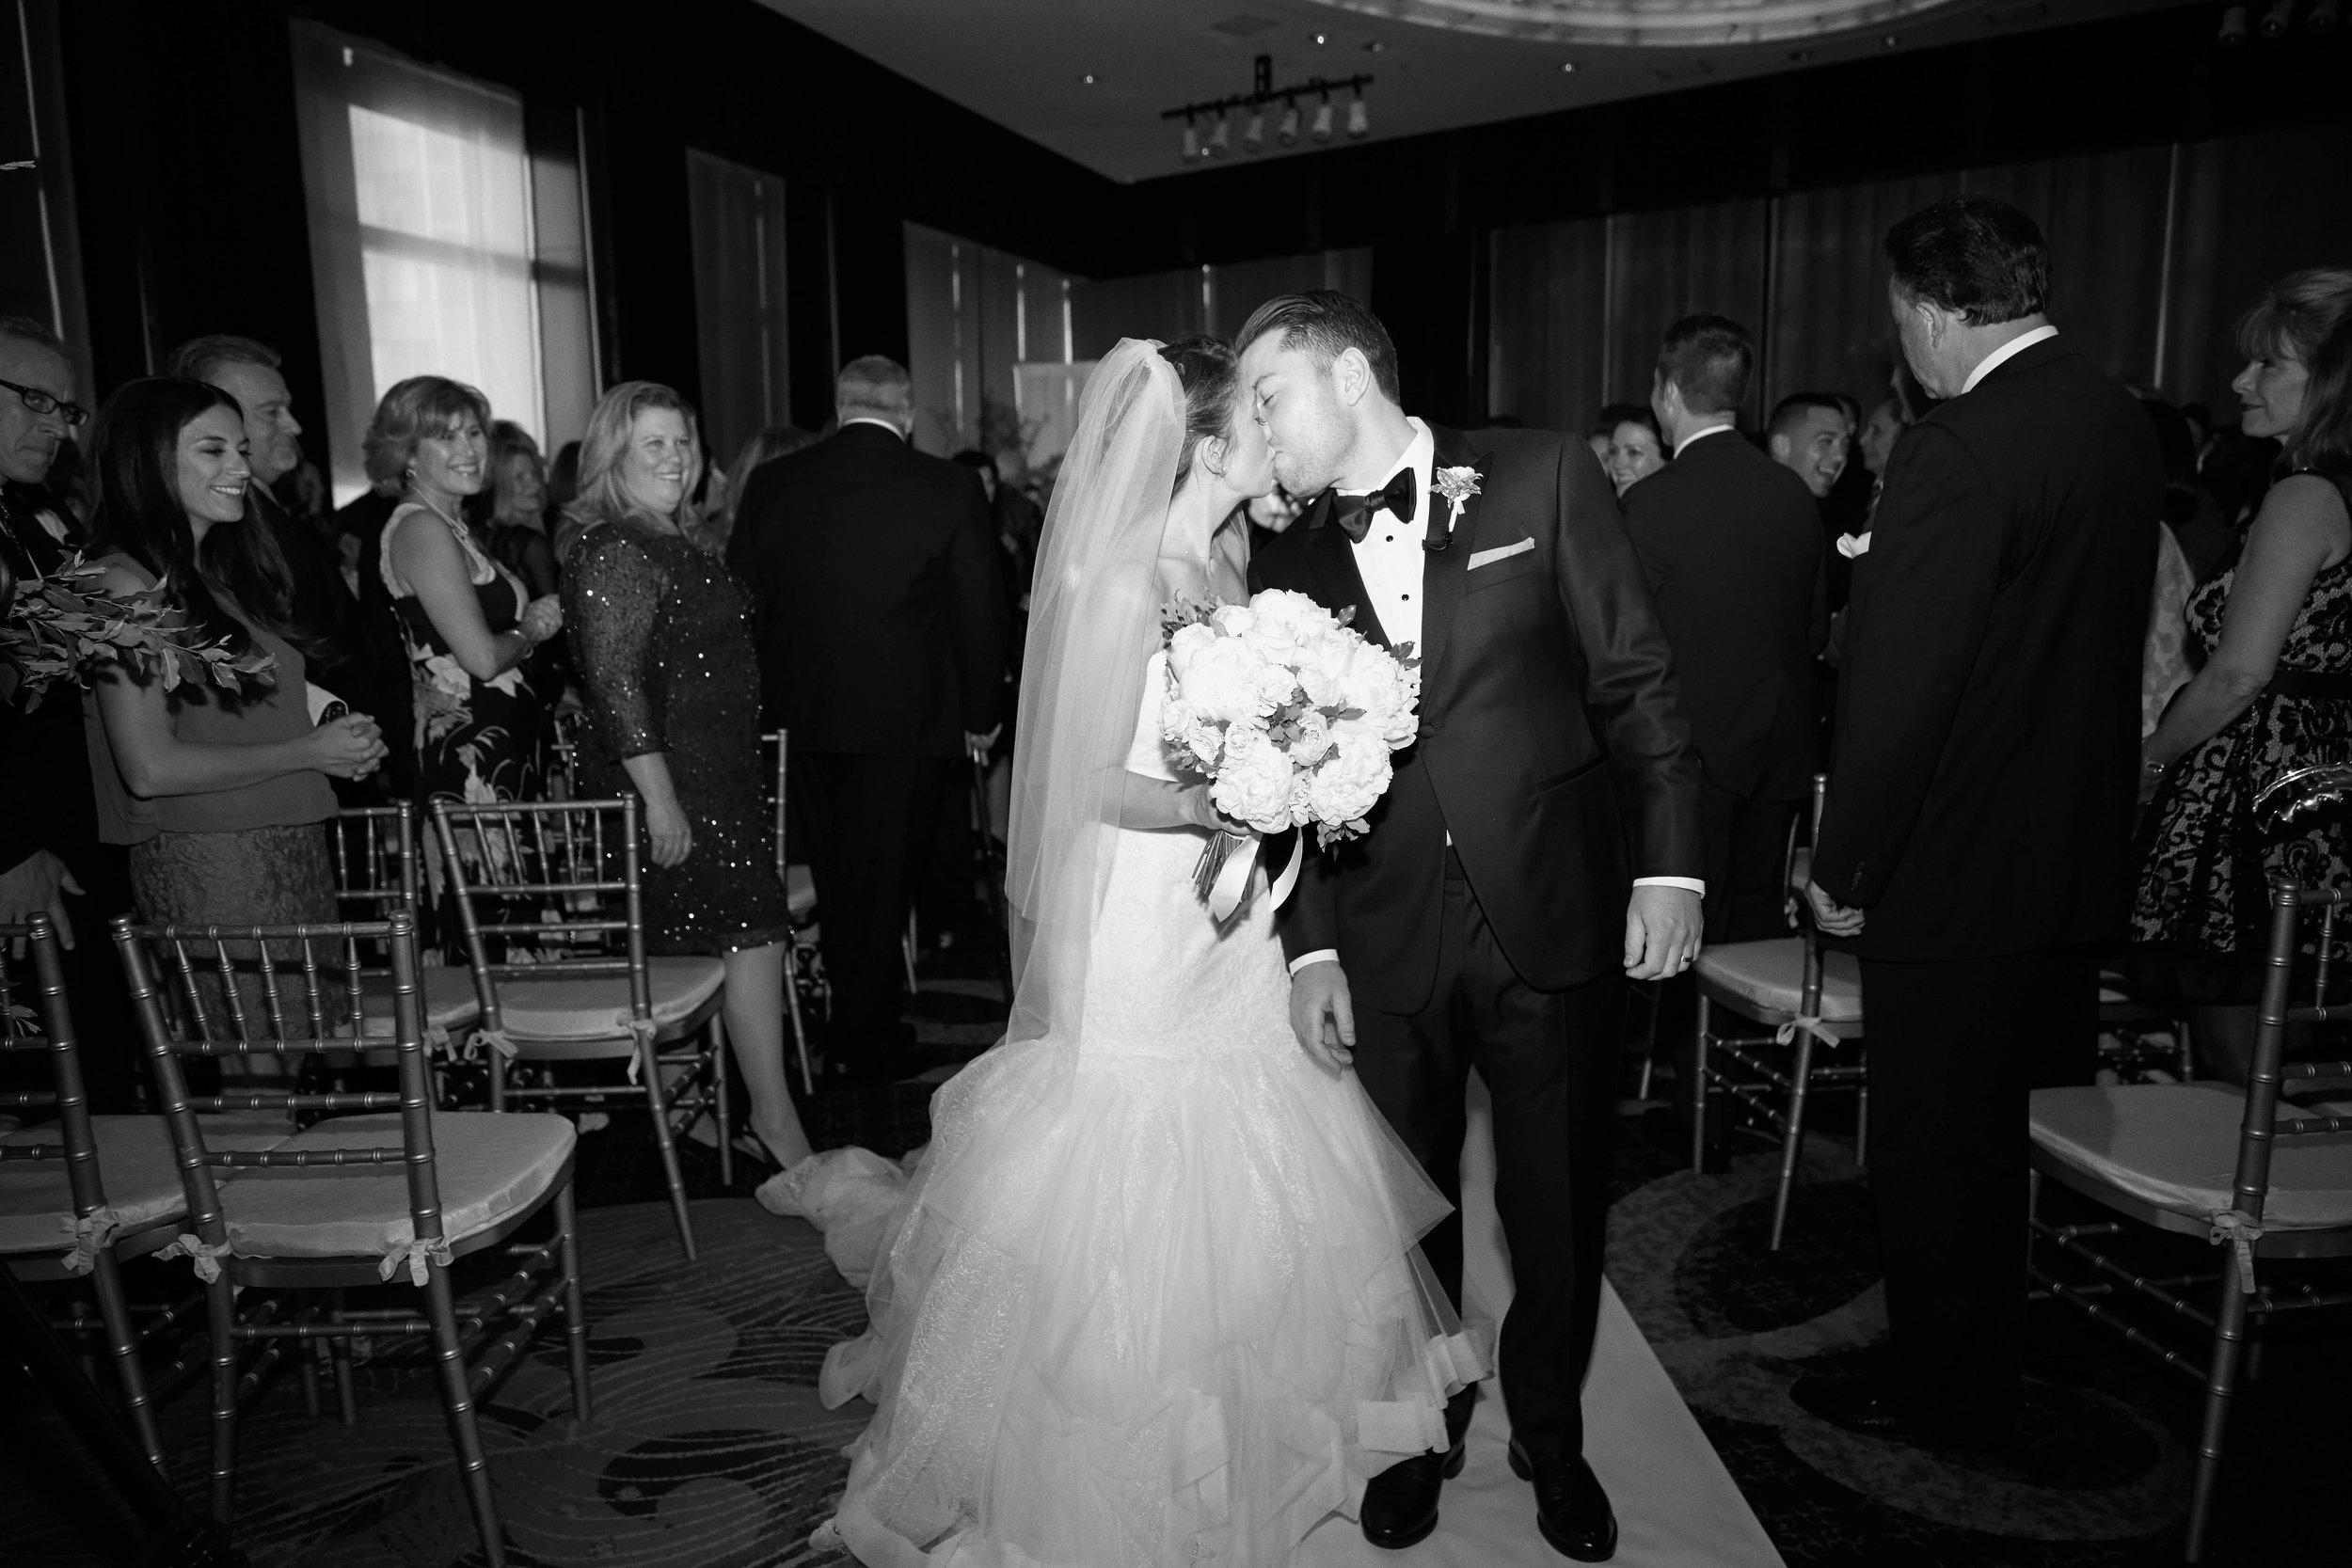 wedding-new-york-city-photoshoot-pink-bowtie-ct